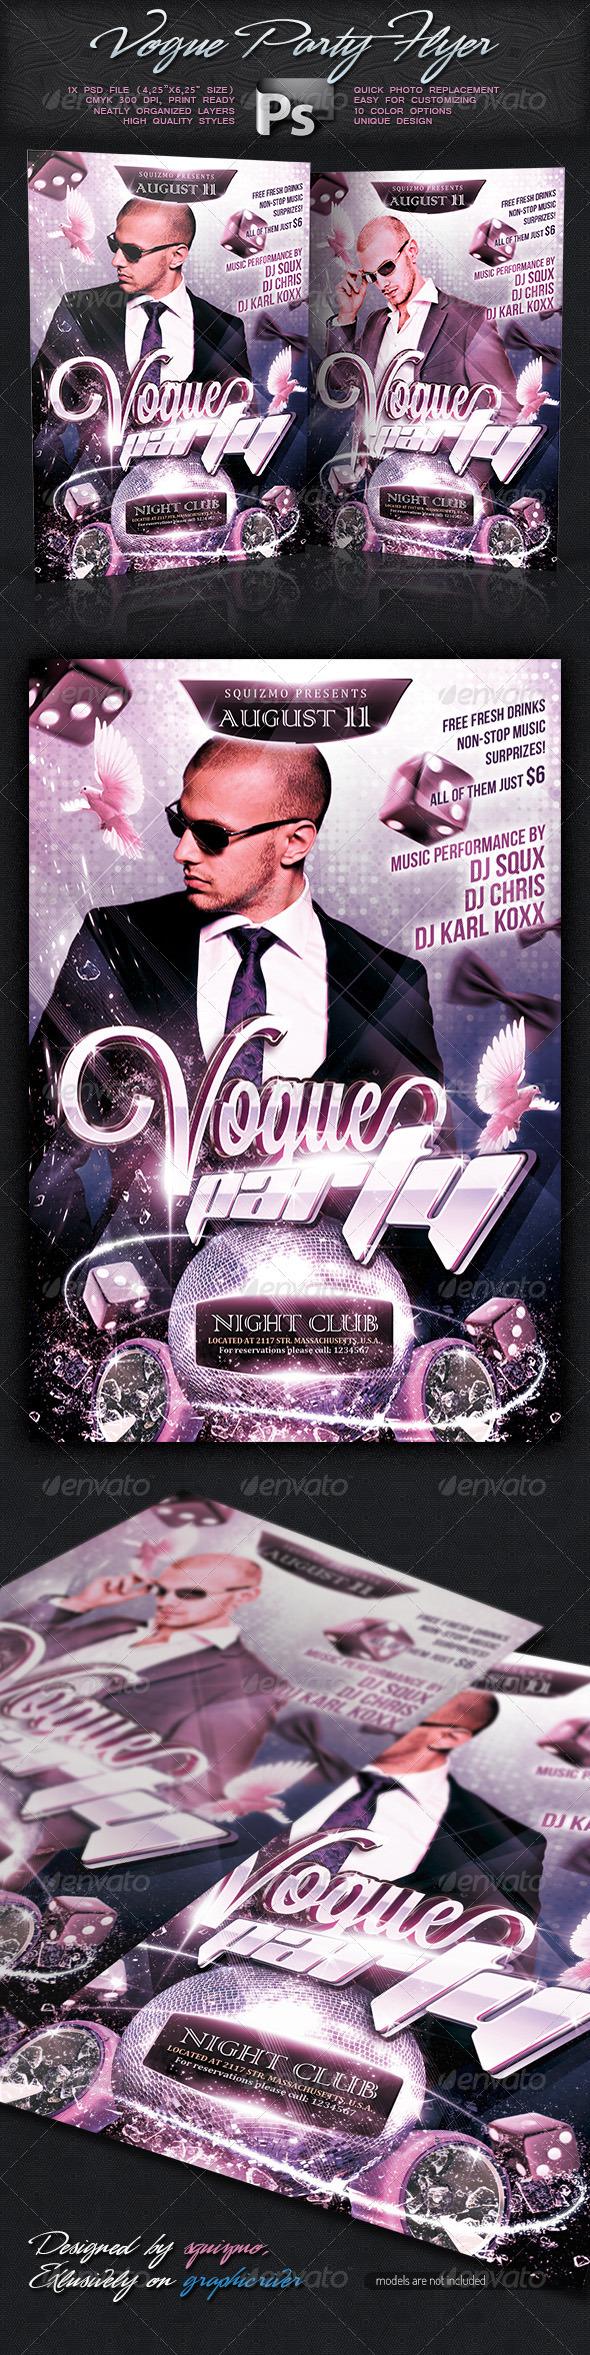 Vogue Show / Party Flyer - Clubs & Parties Events